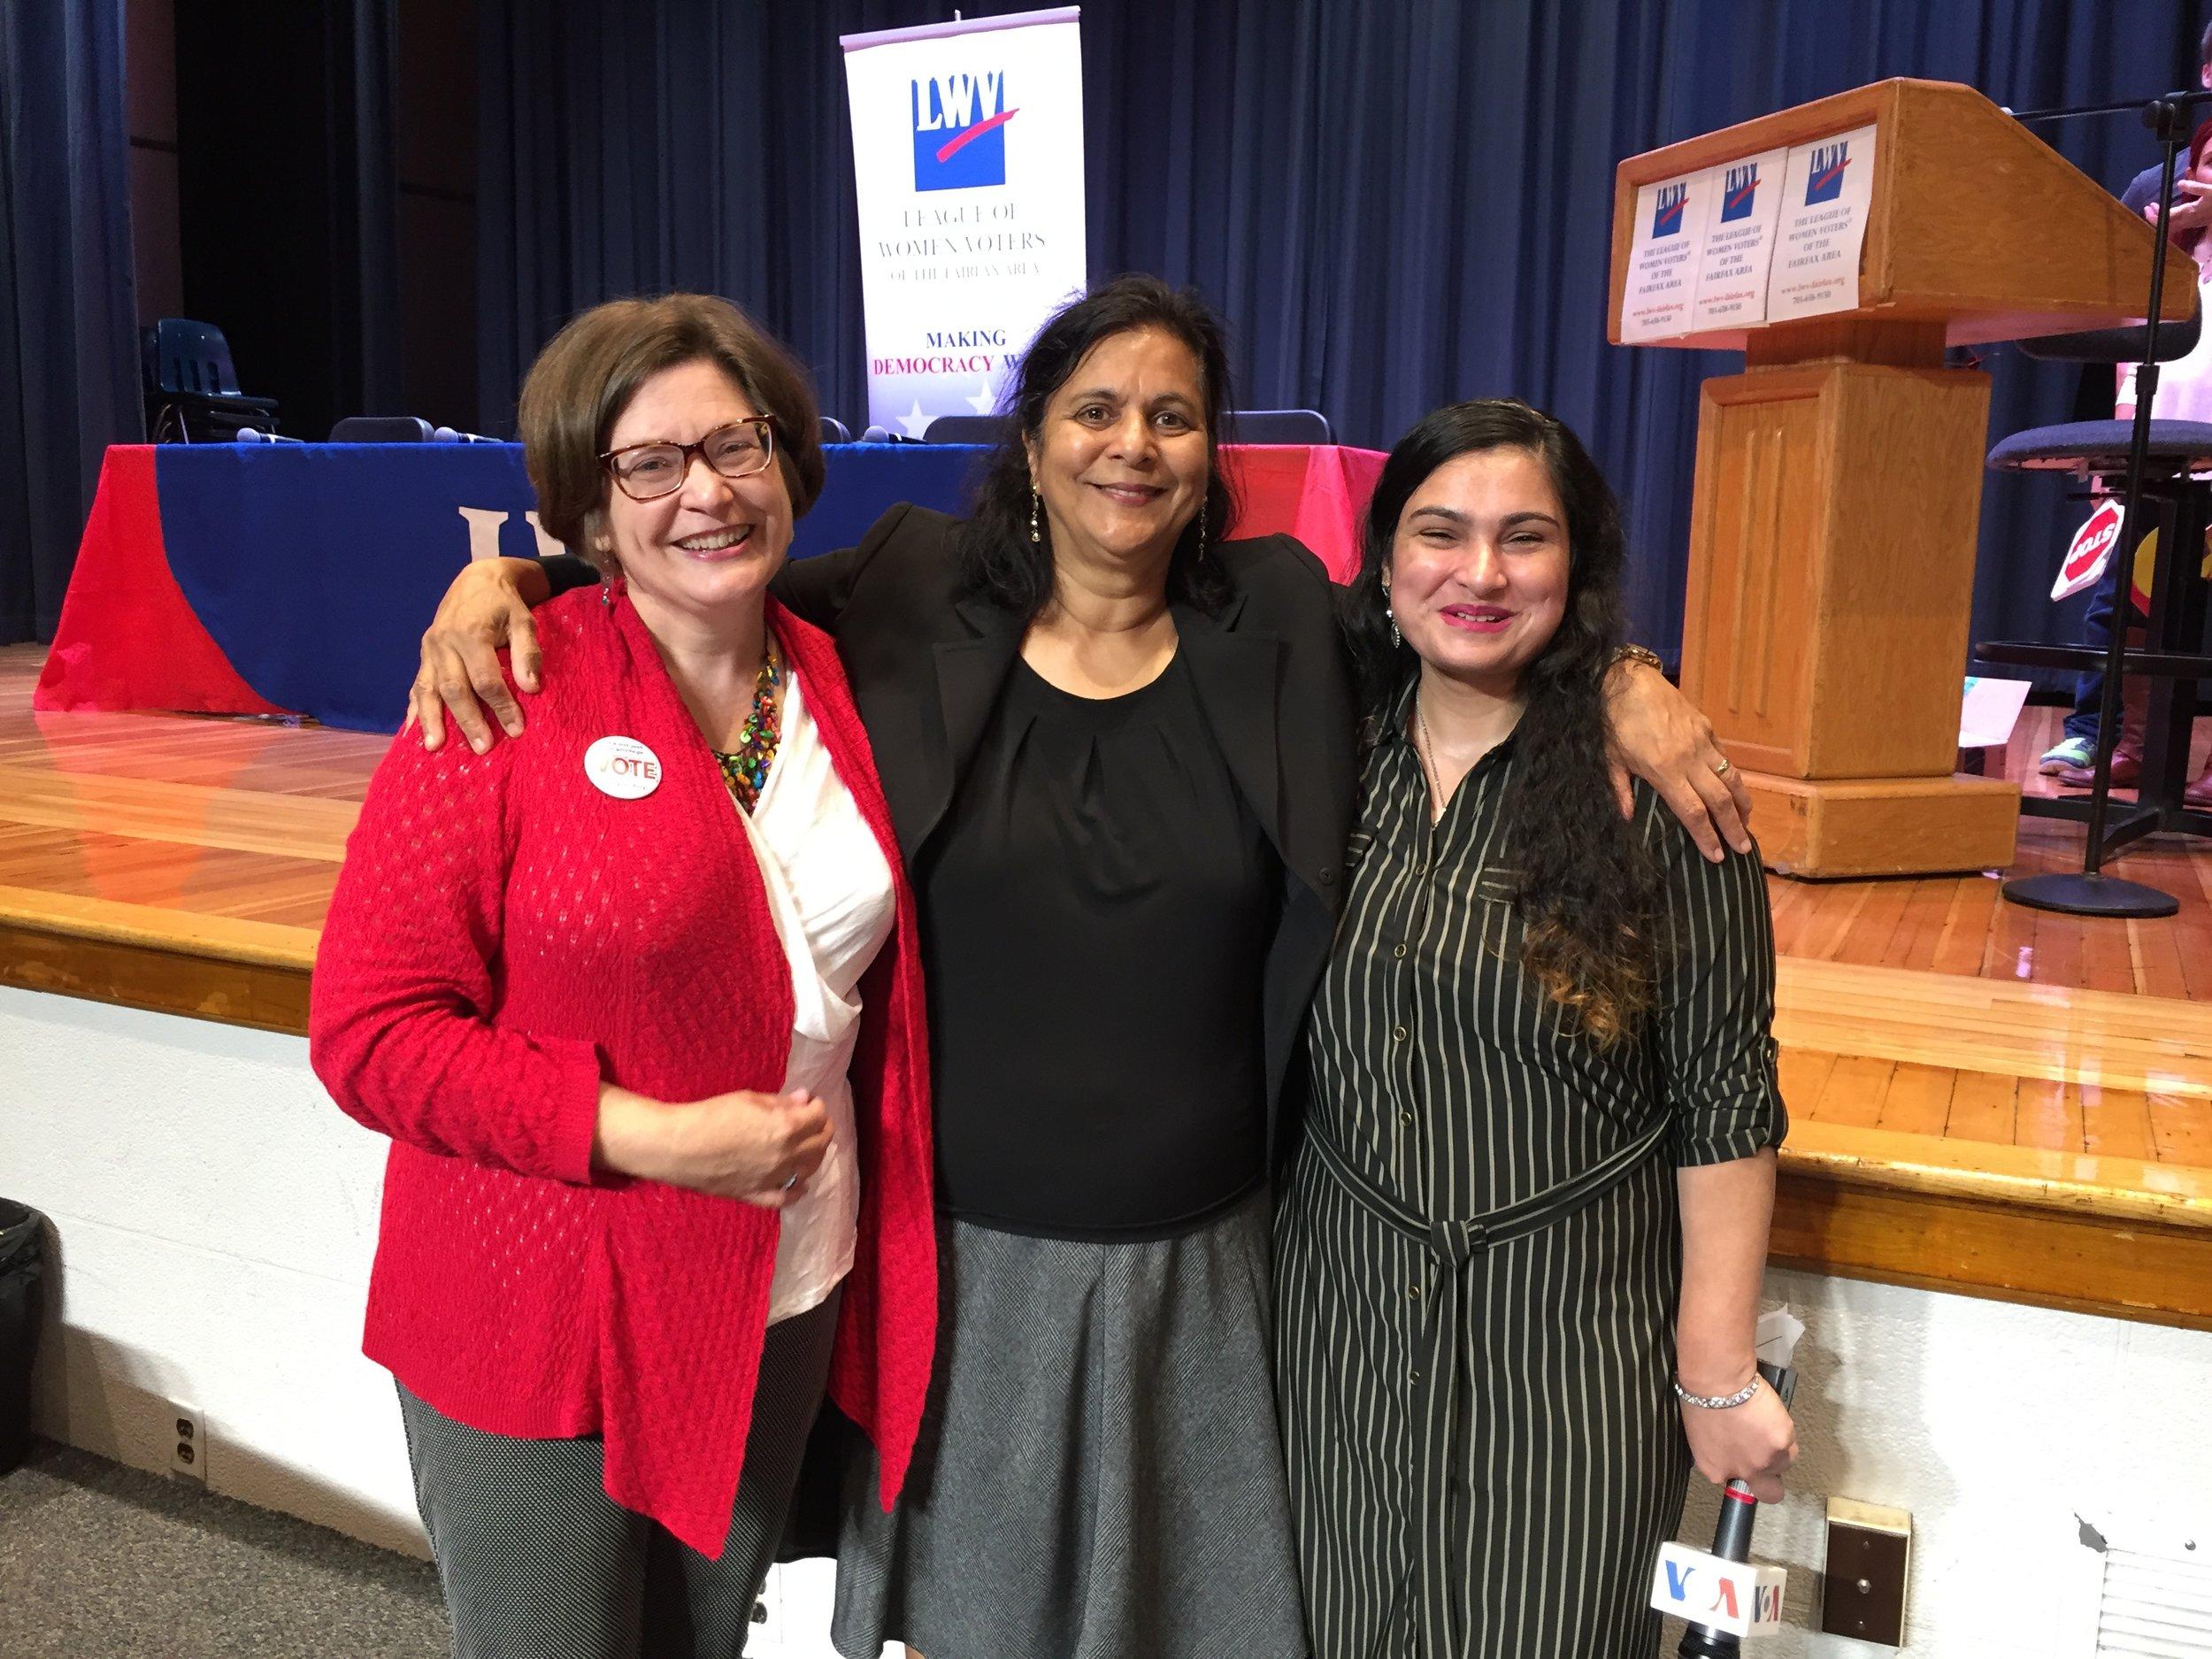 Beth tudan, LWV of Fairfax Executive Director, and adarsh trehan, discuss our work and history with Nilofar mugha, VOA Pakistan Reporter.